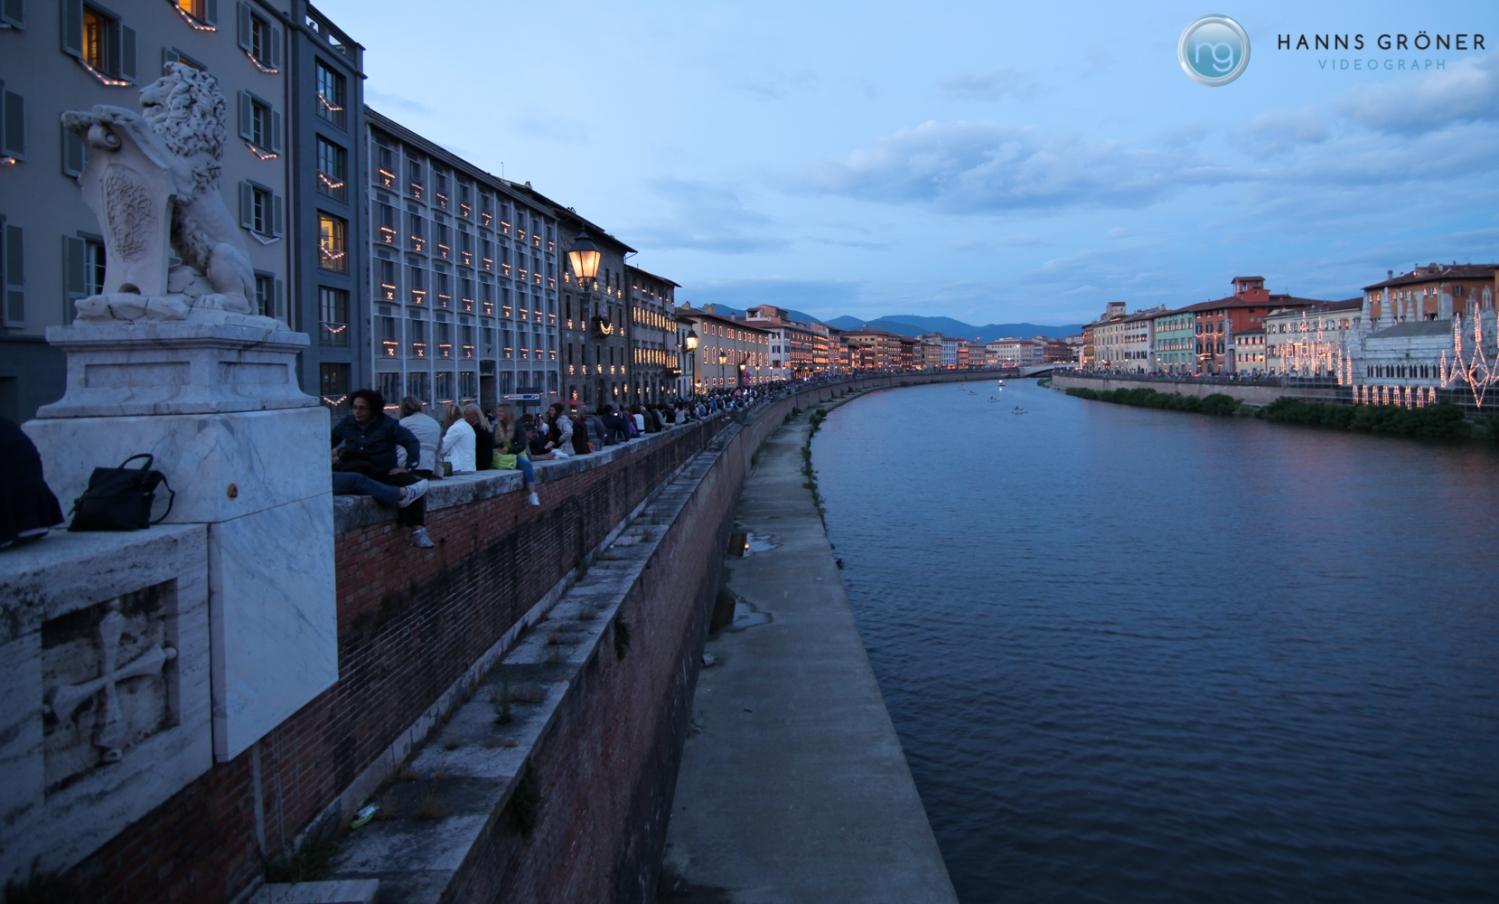 Italien |Pisa - Luminaria di San Ranieri